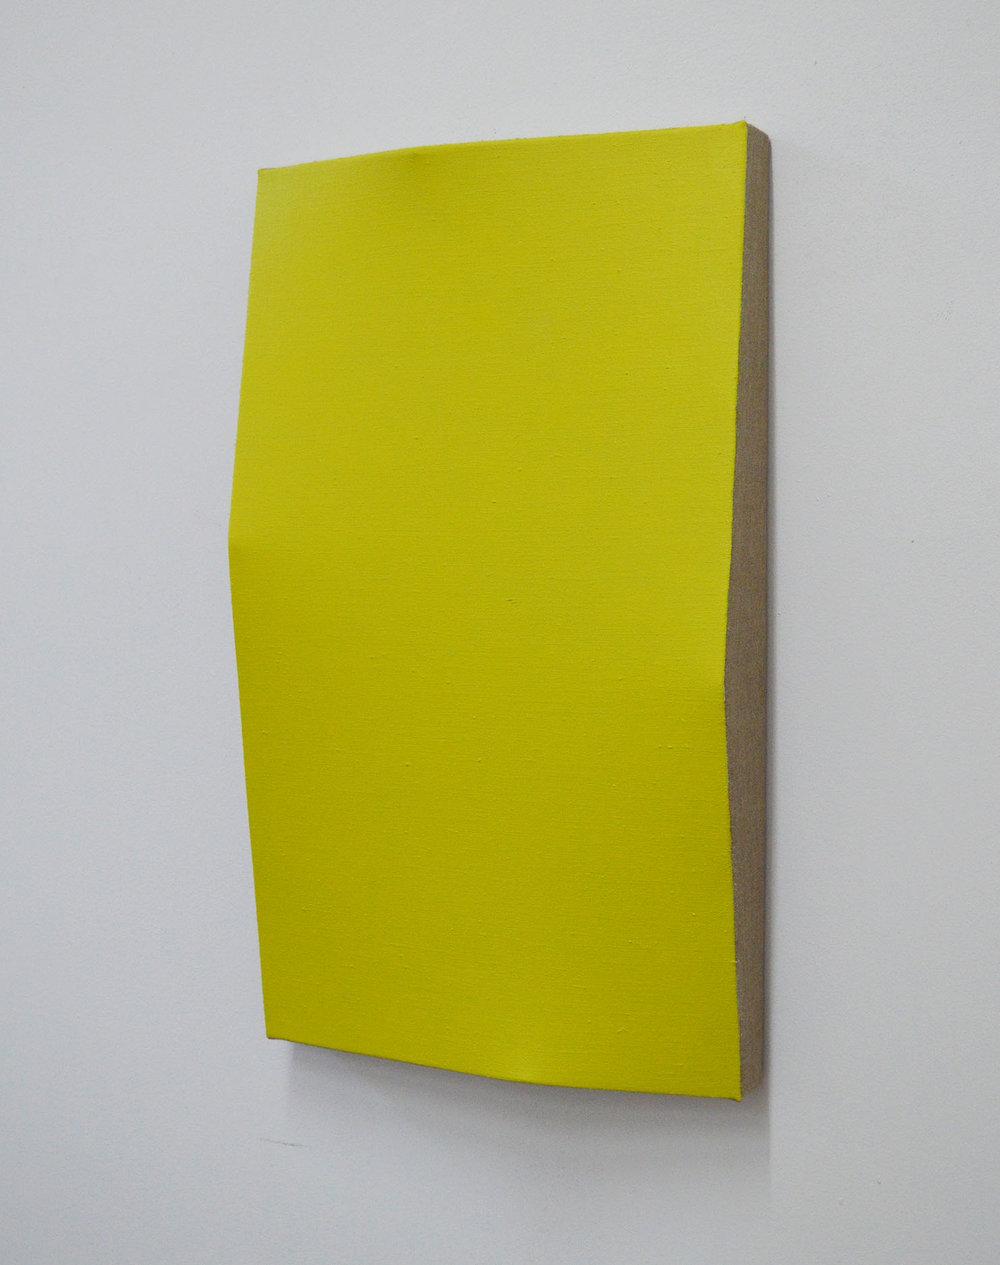 Untitled (852)